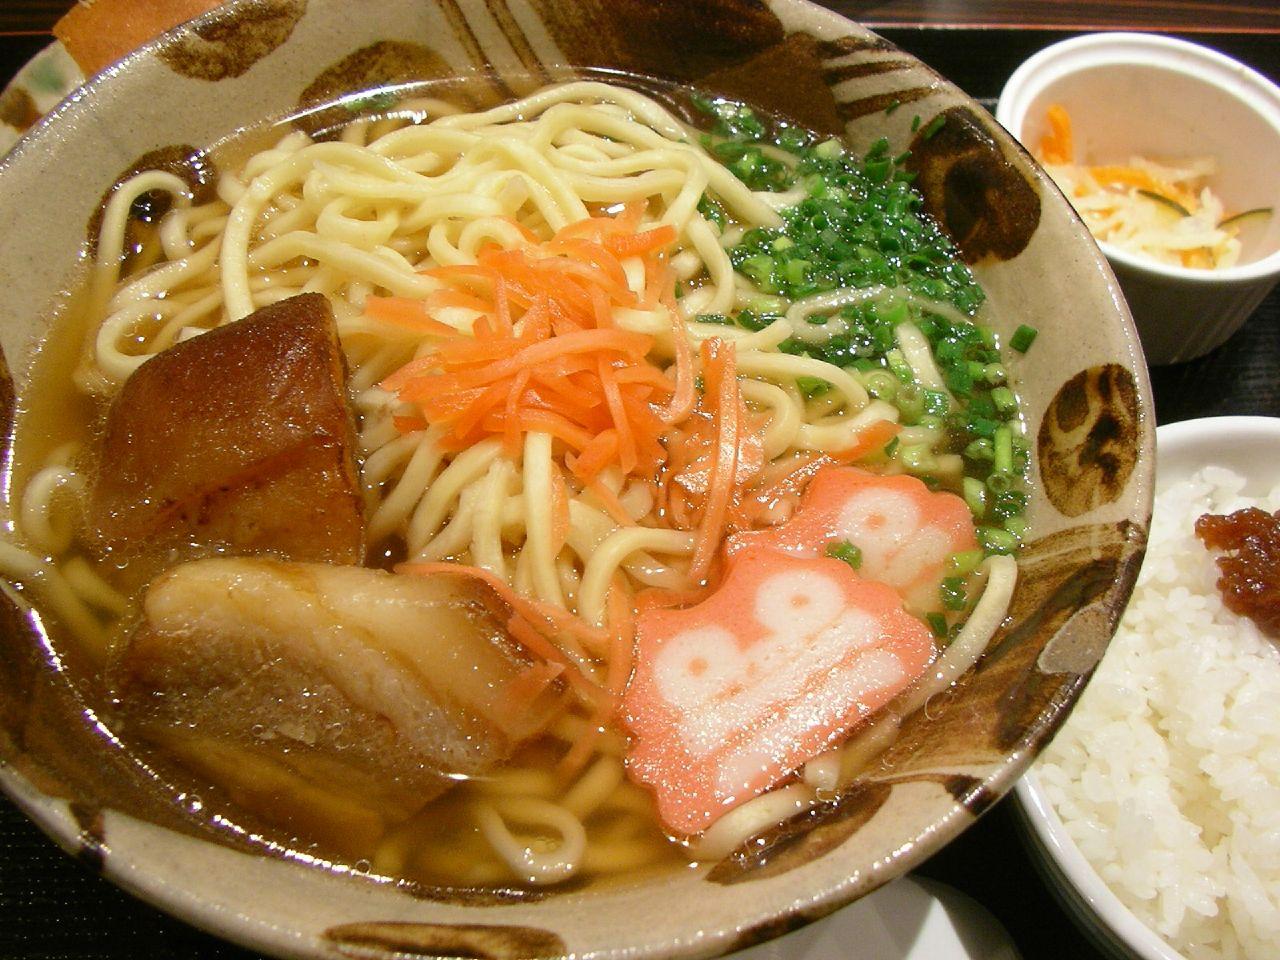 Okinawa Soba @ Omotesando 沖縄そば(う~みや うーちばる)